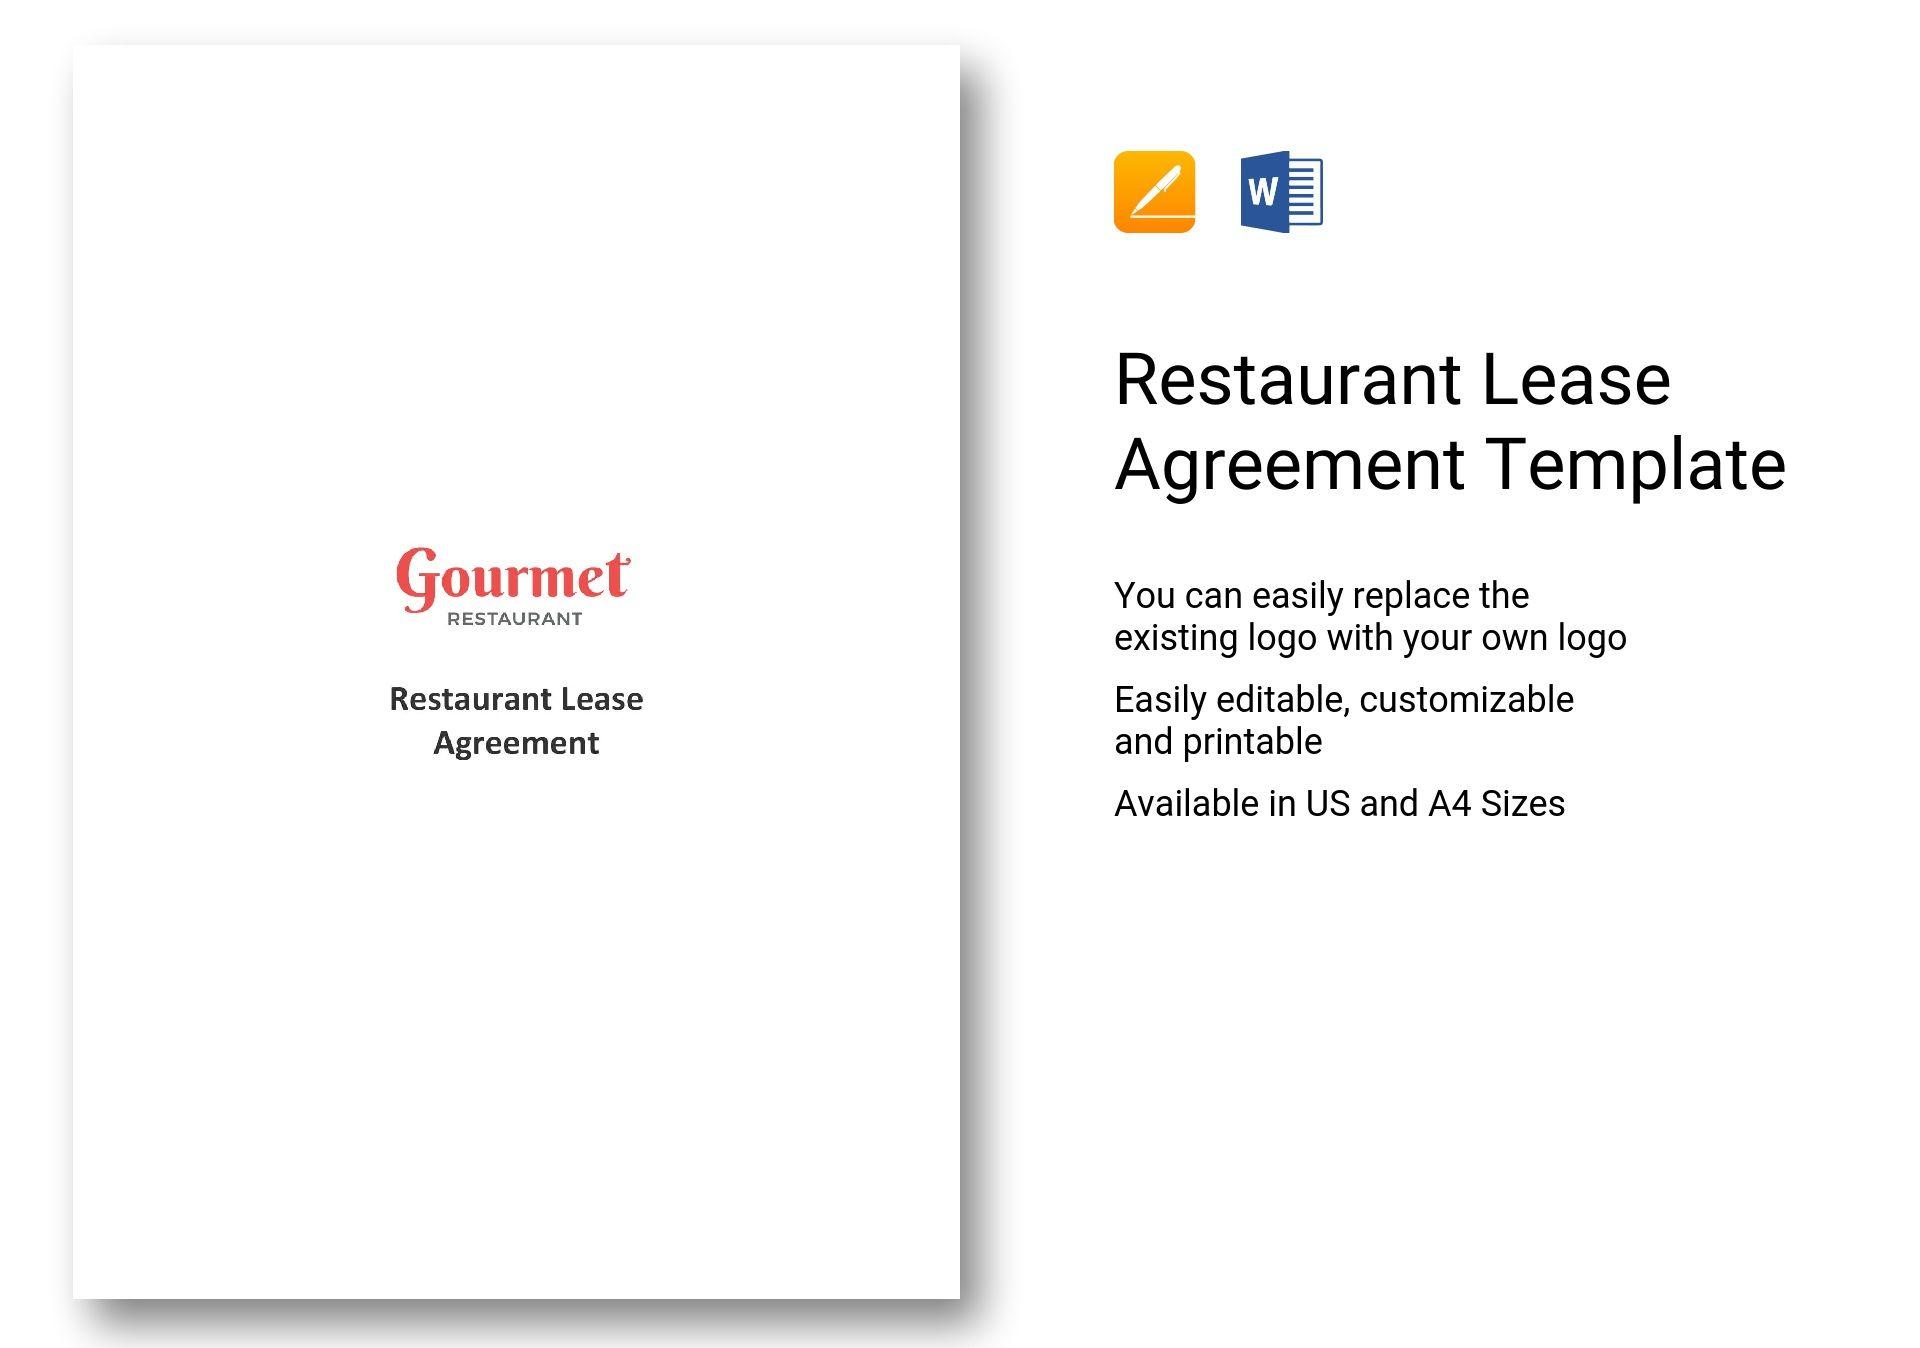 Restaurant Lease Agreement